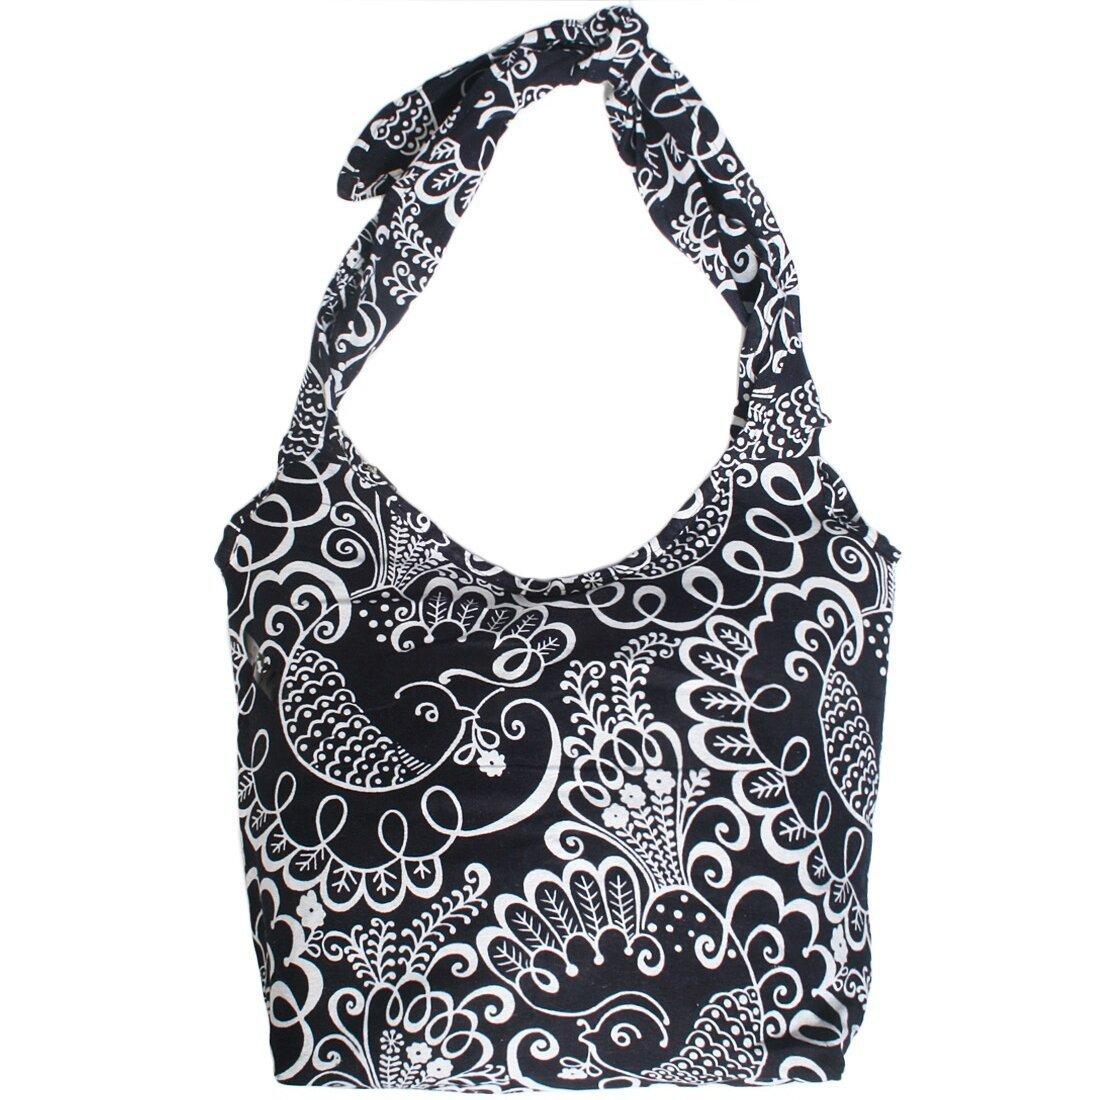 kilofly Large Bohemian Hippie Cloth Crossbody Shoulder Bag, Adjustable Strap AWP314s12